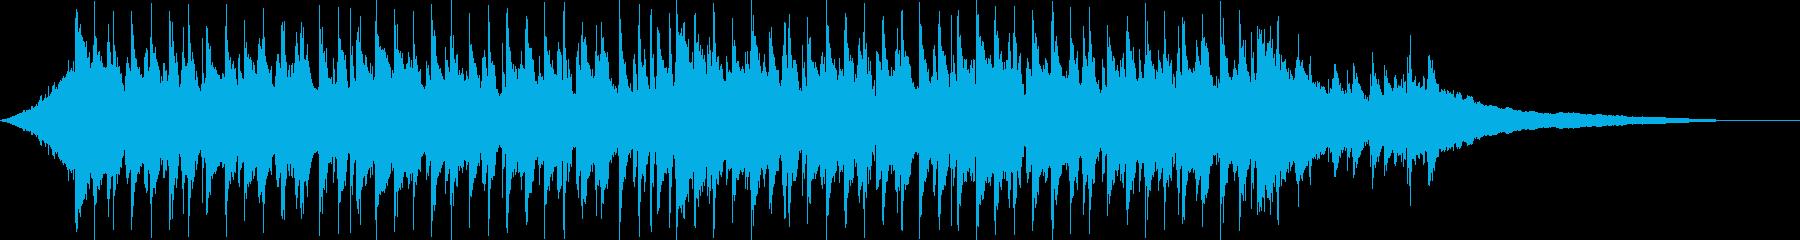 Happy Ukulele 19の再生済みの波形